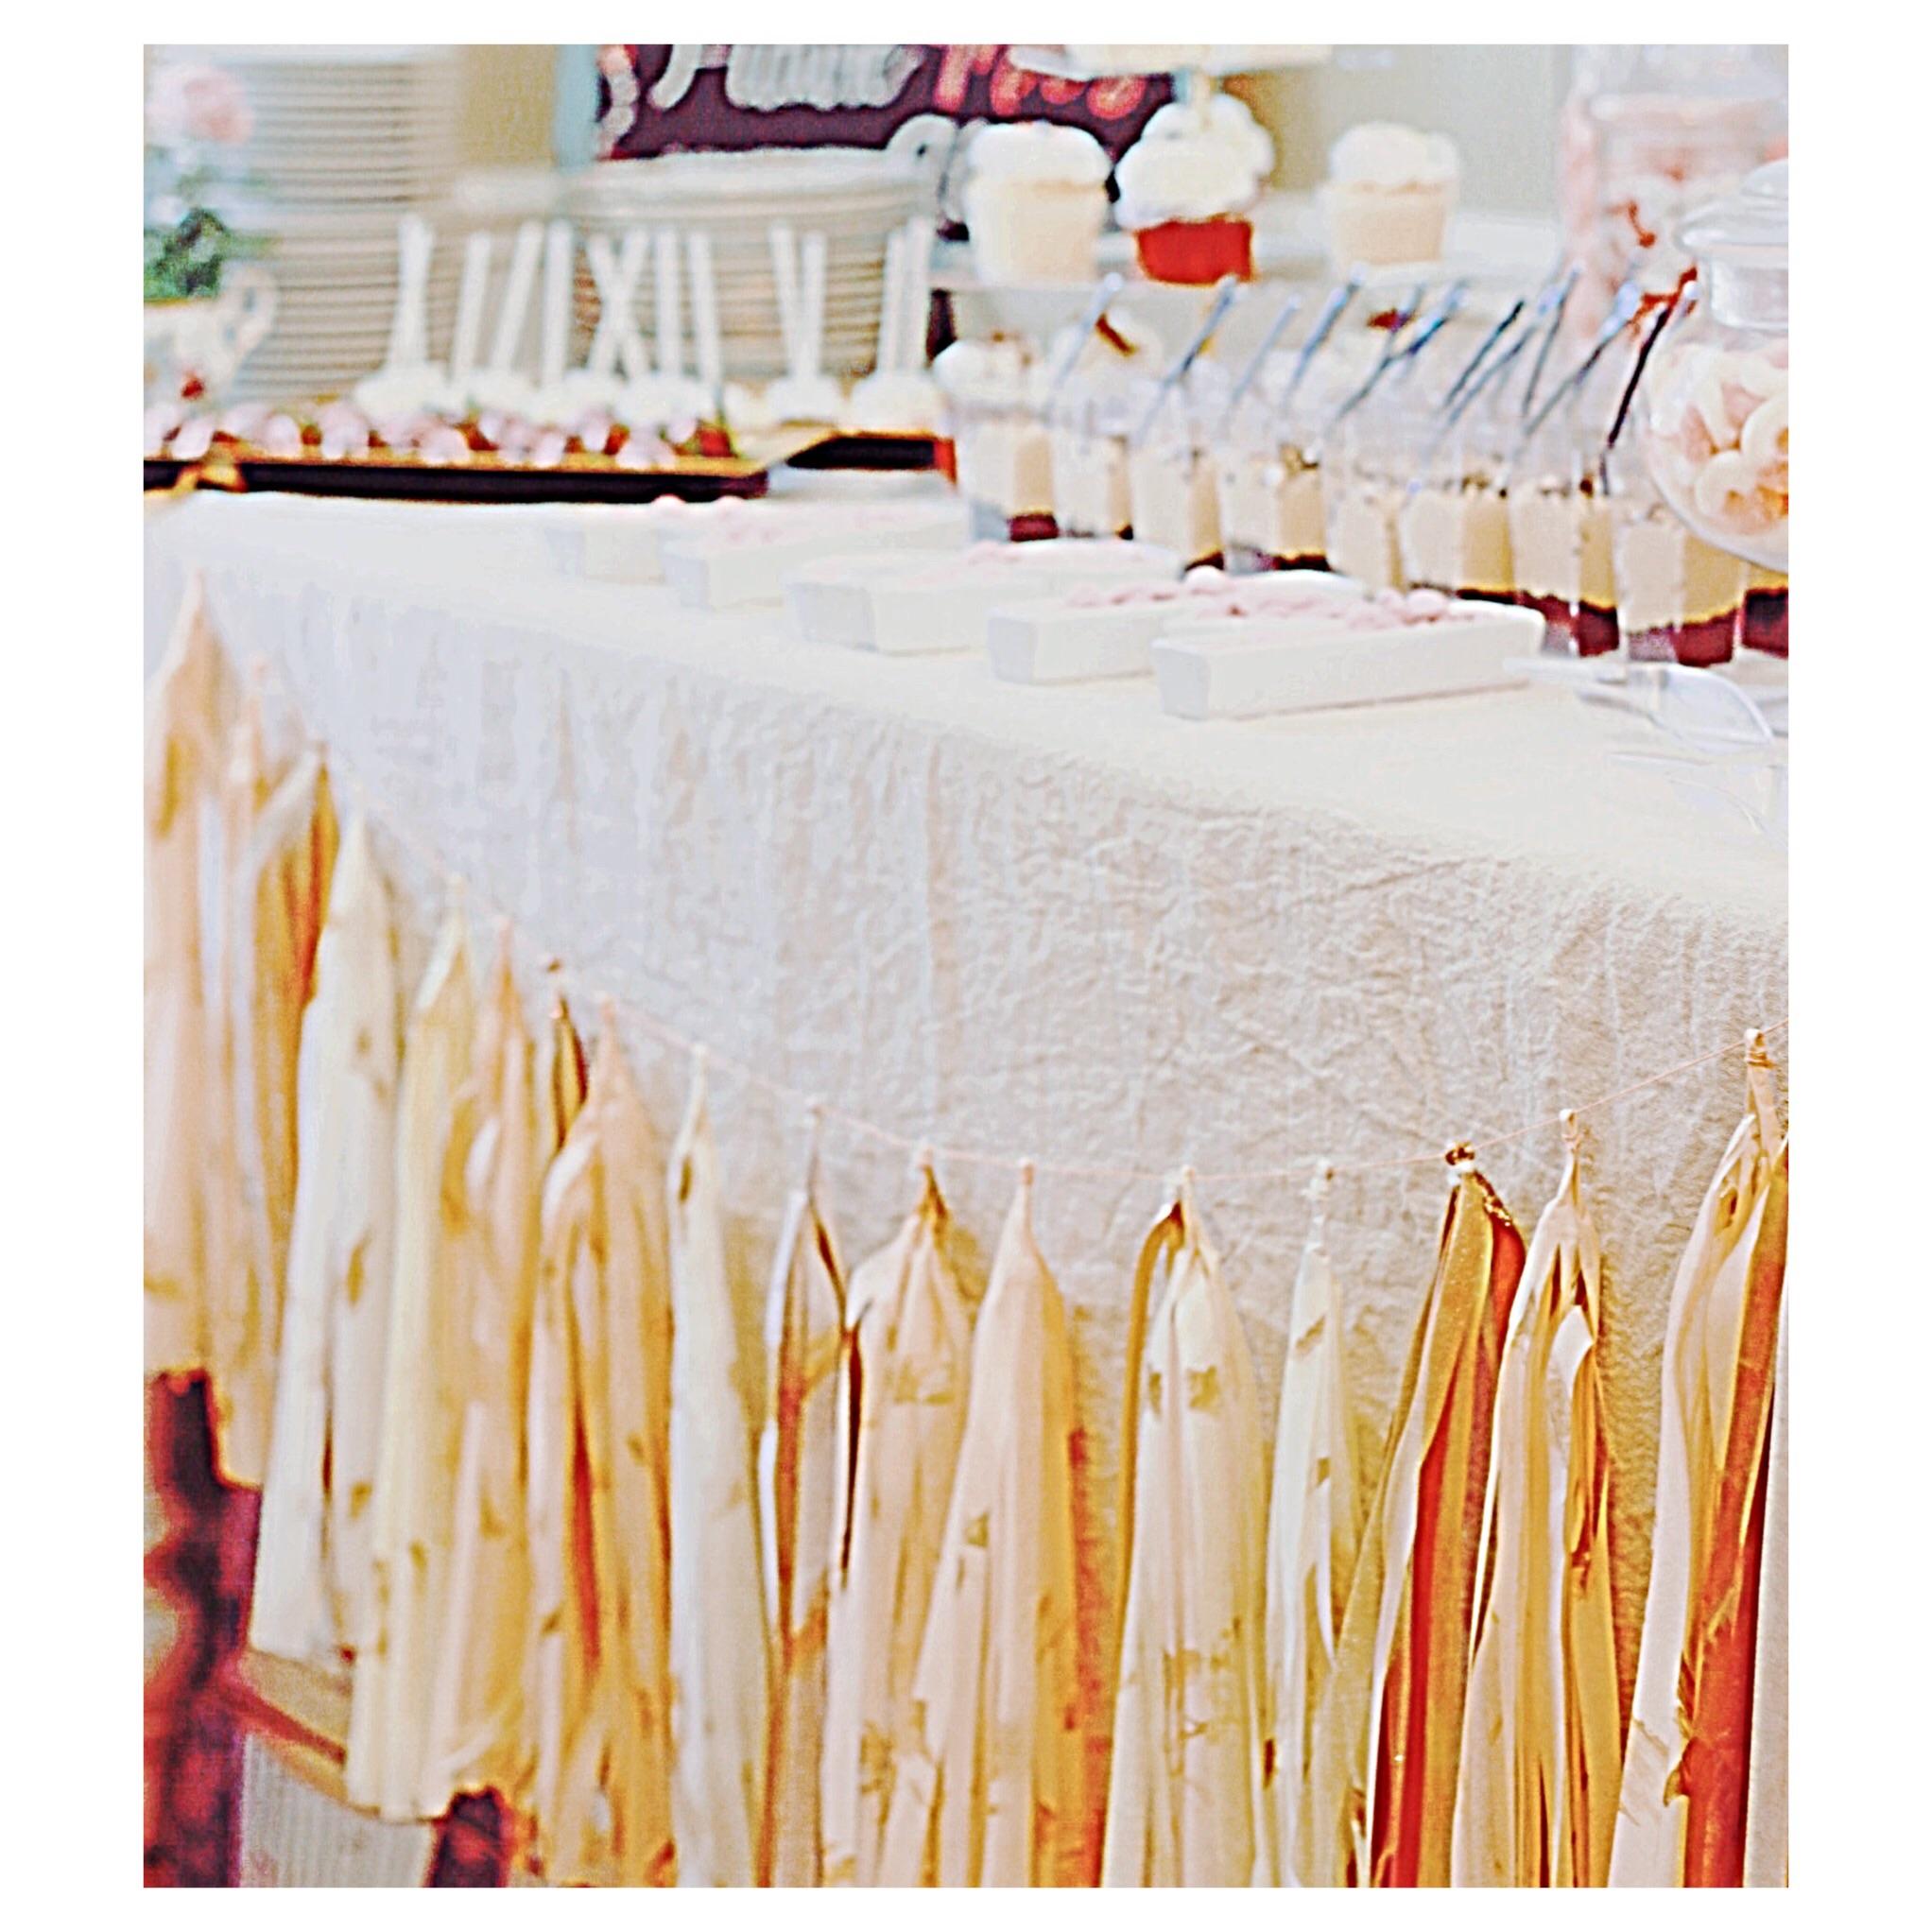 garland on dessert table